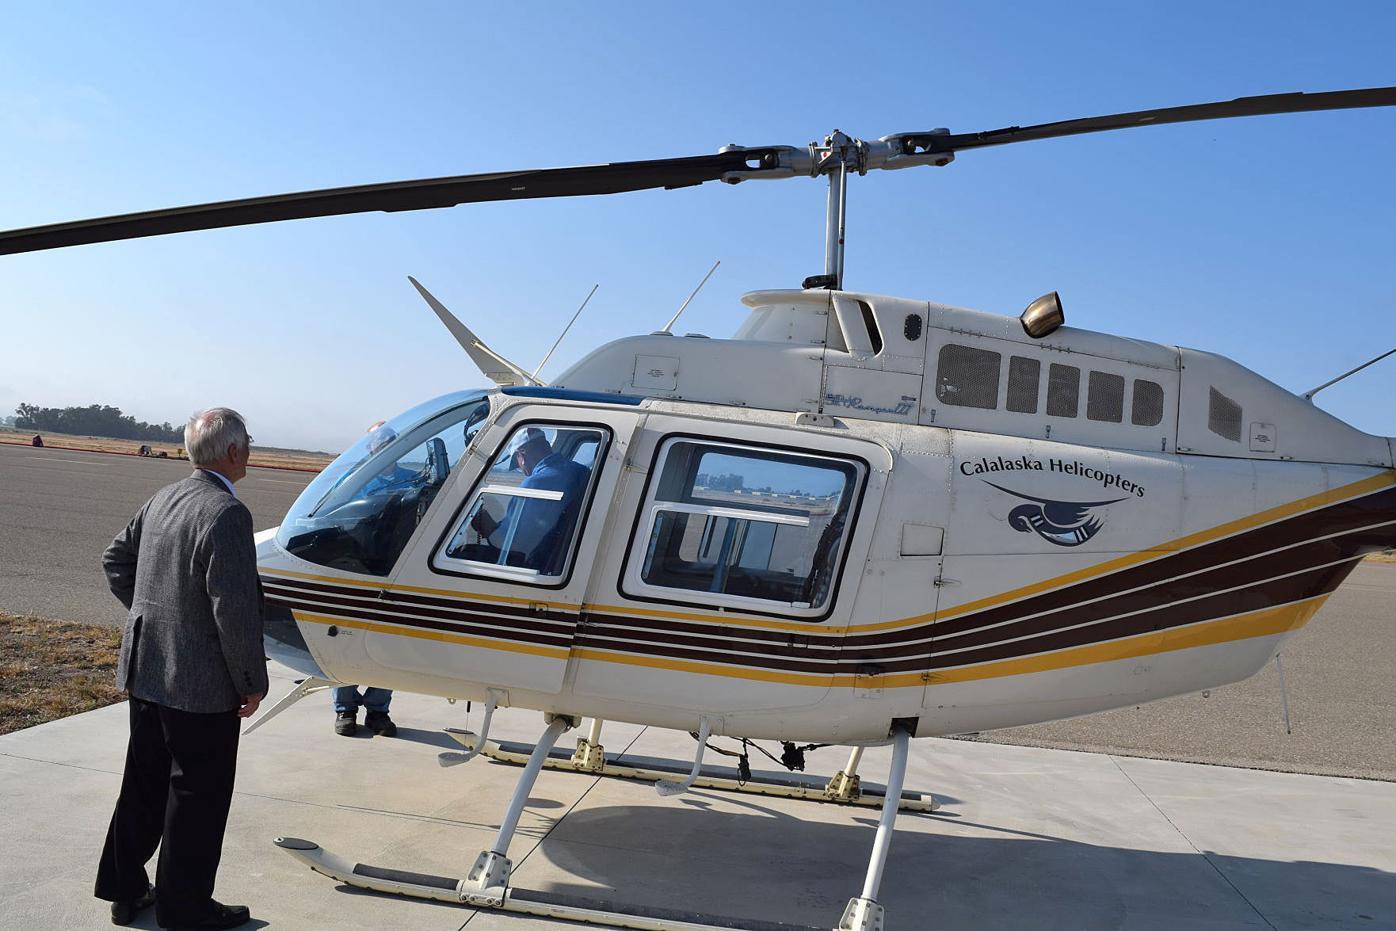 Calalaska helicopter 2